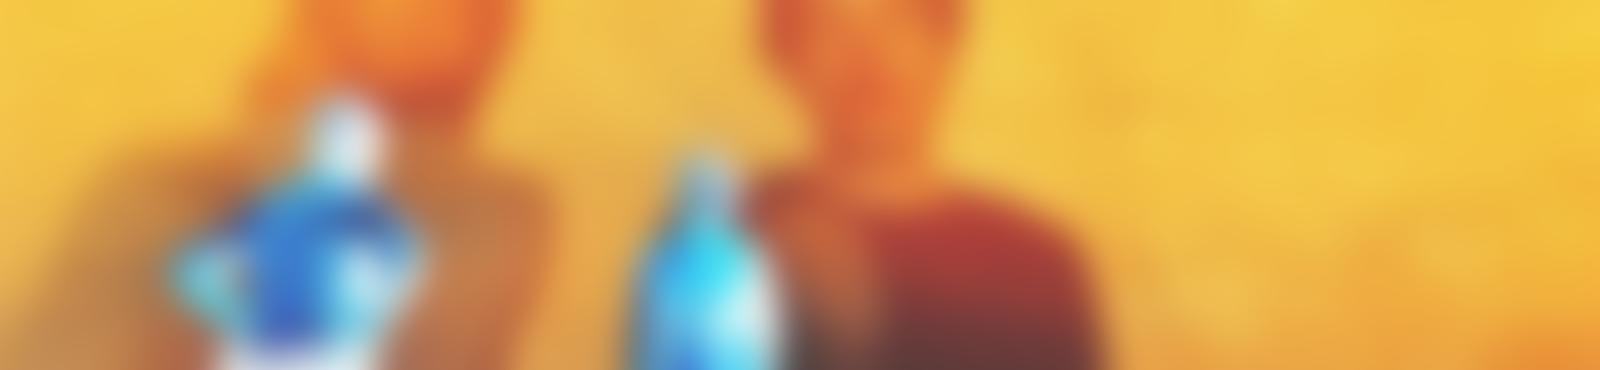 Blurred 433f9543 0b5c 4c26 b0ab 32188566d2be